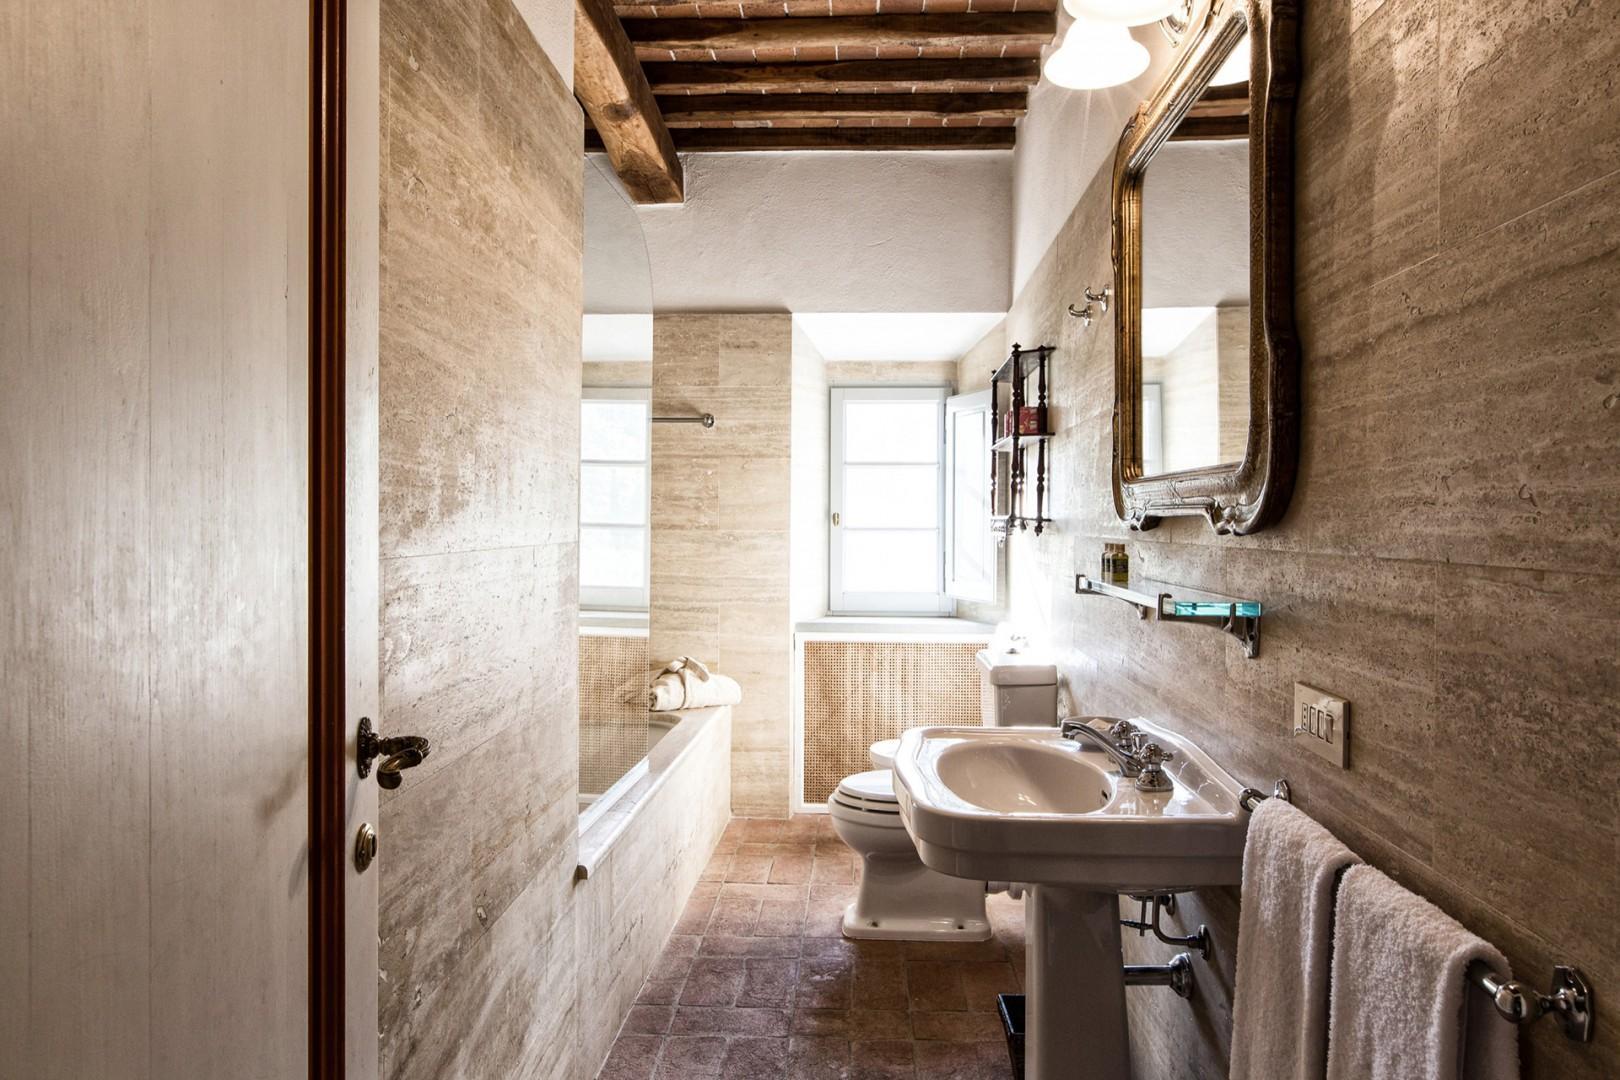 Rustic charm in each of the en suite bathrooms of this villa.